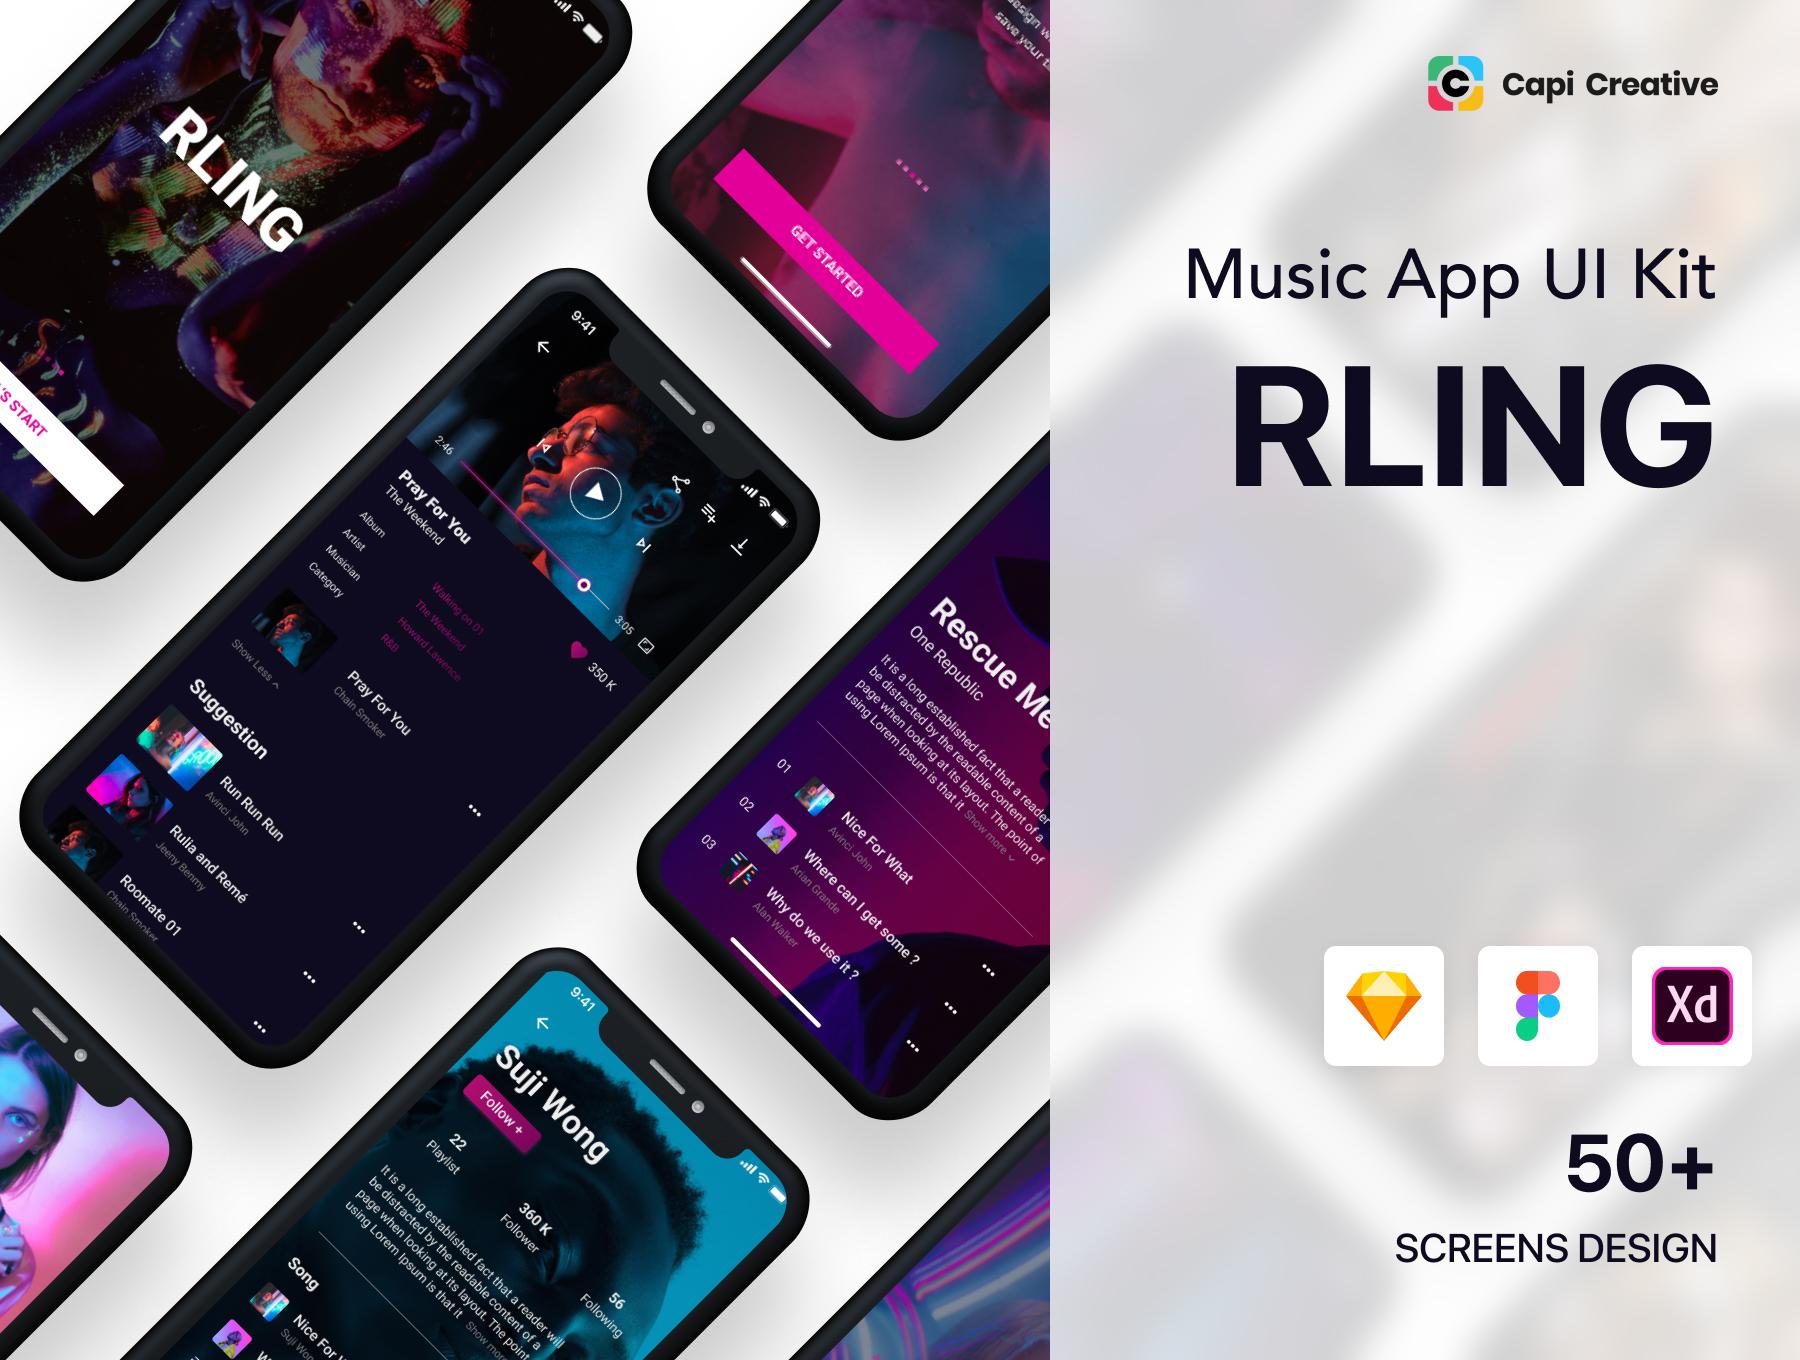 RLing - Amazing Music App UI Kit Premium UI Kit For Figma, Sketch, Adobe XD